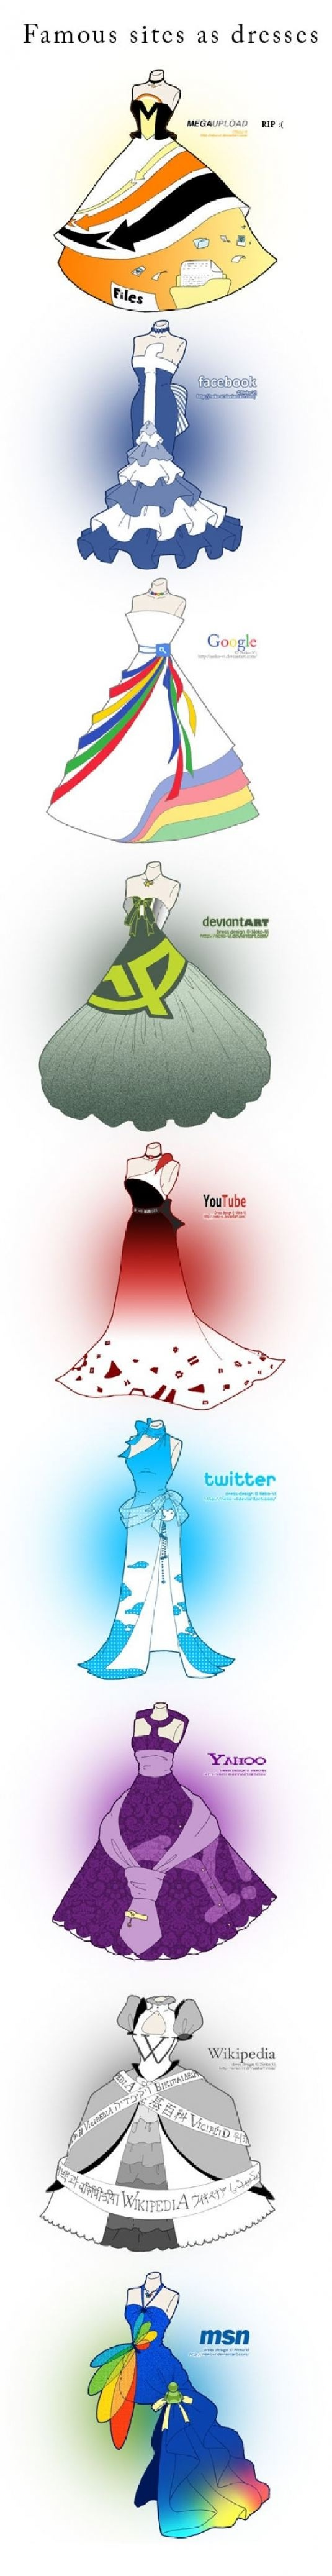 Popular websites re-imagined as dresses.